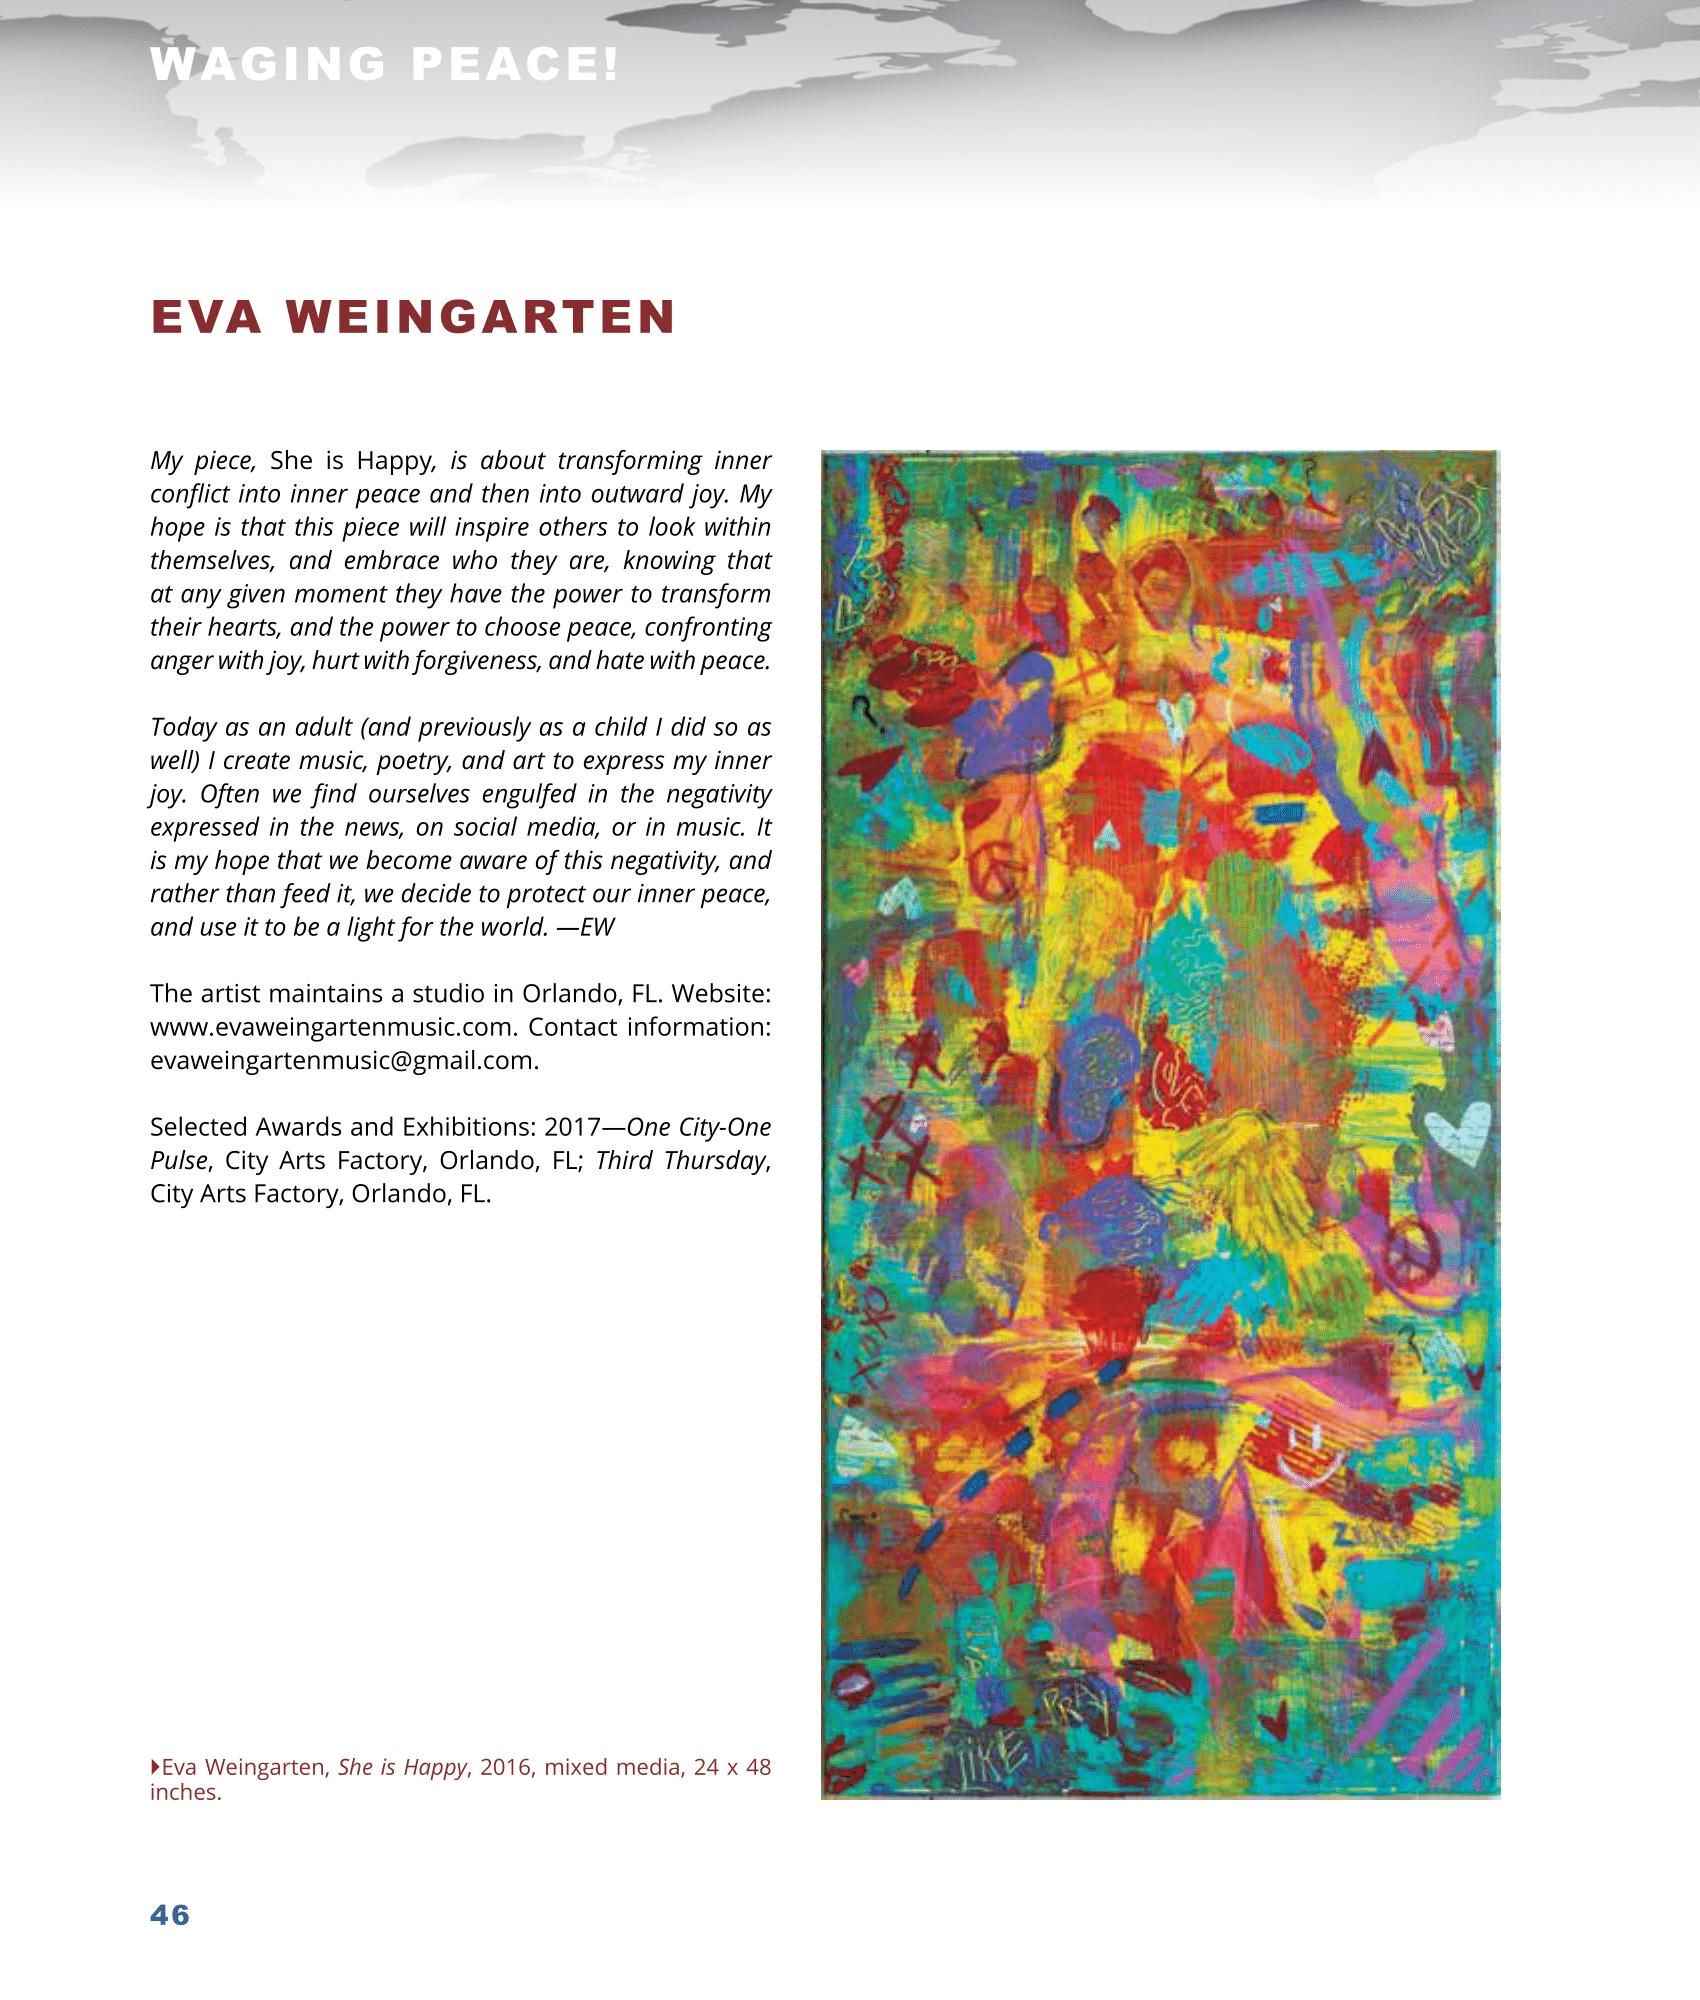 Waging Peace 9-27a. for Eva Weingarten-2.png